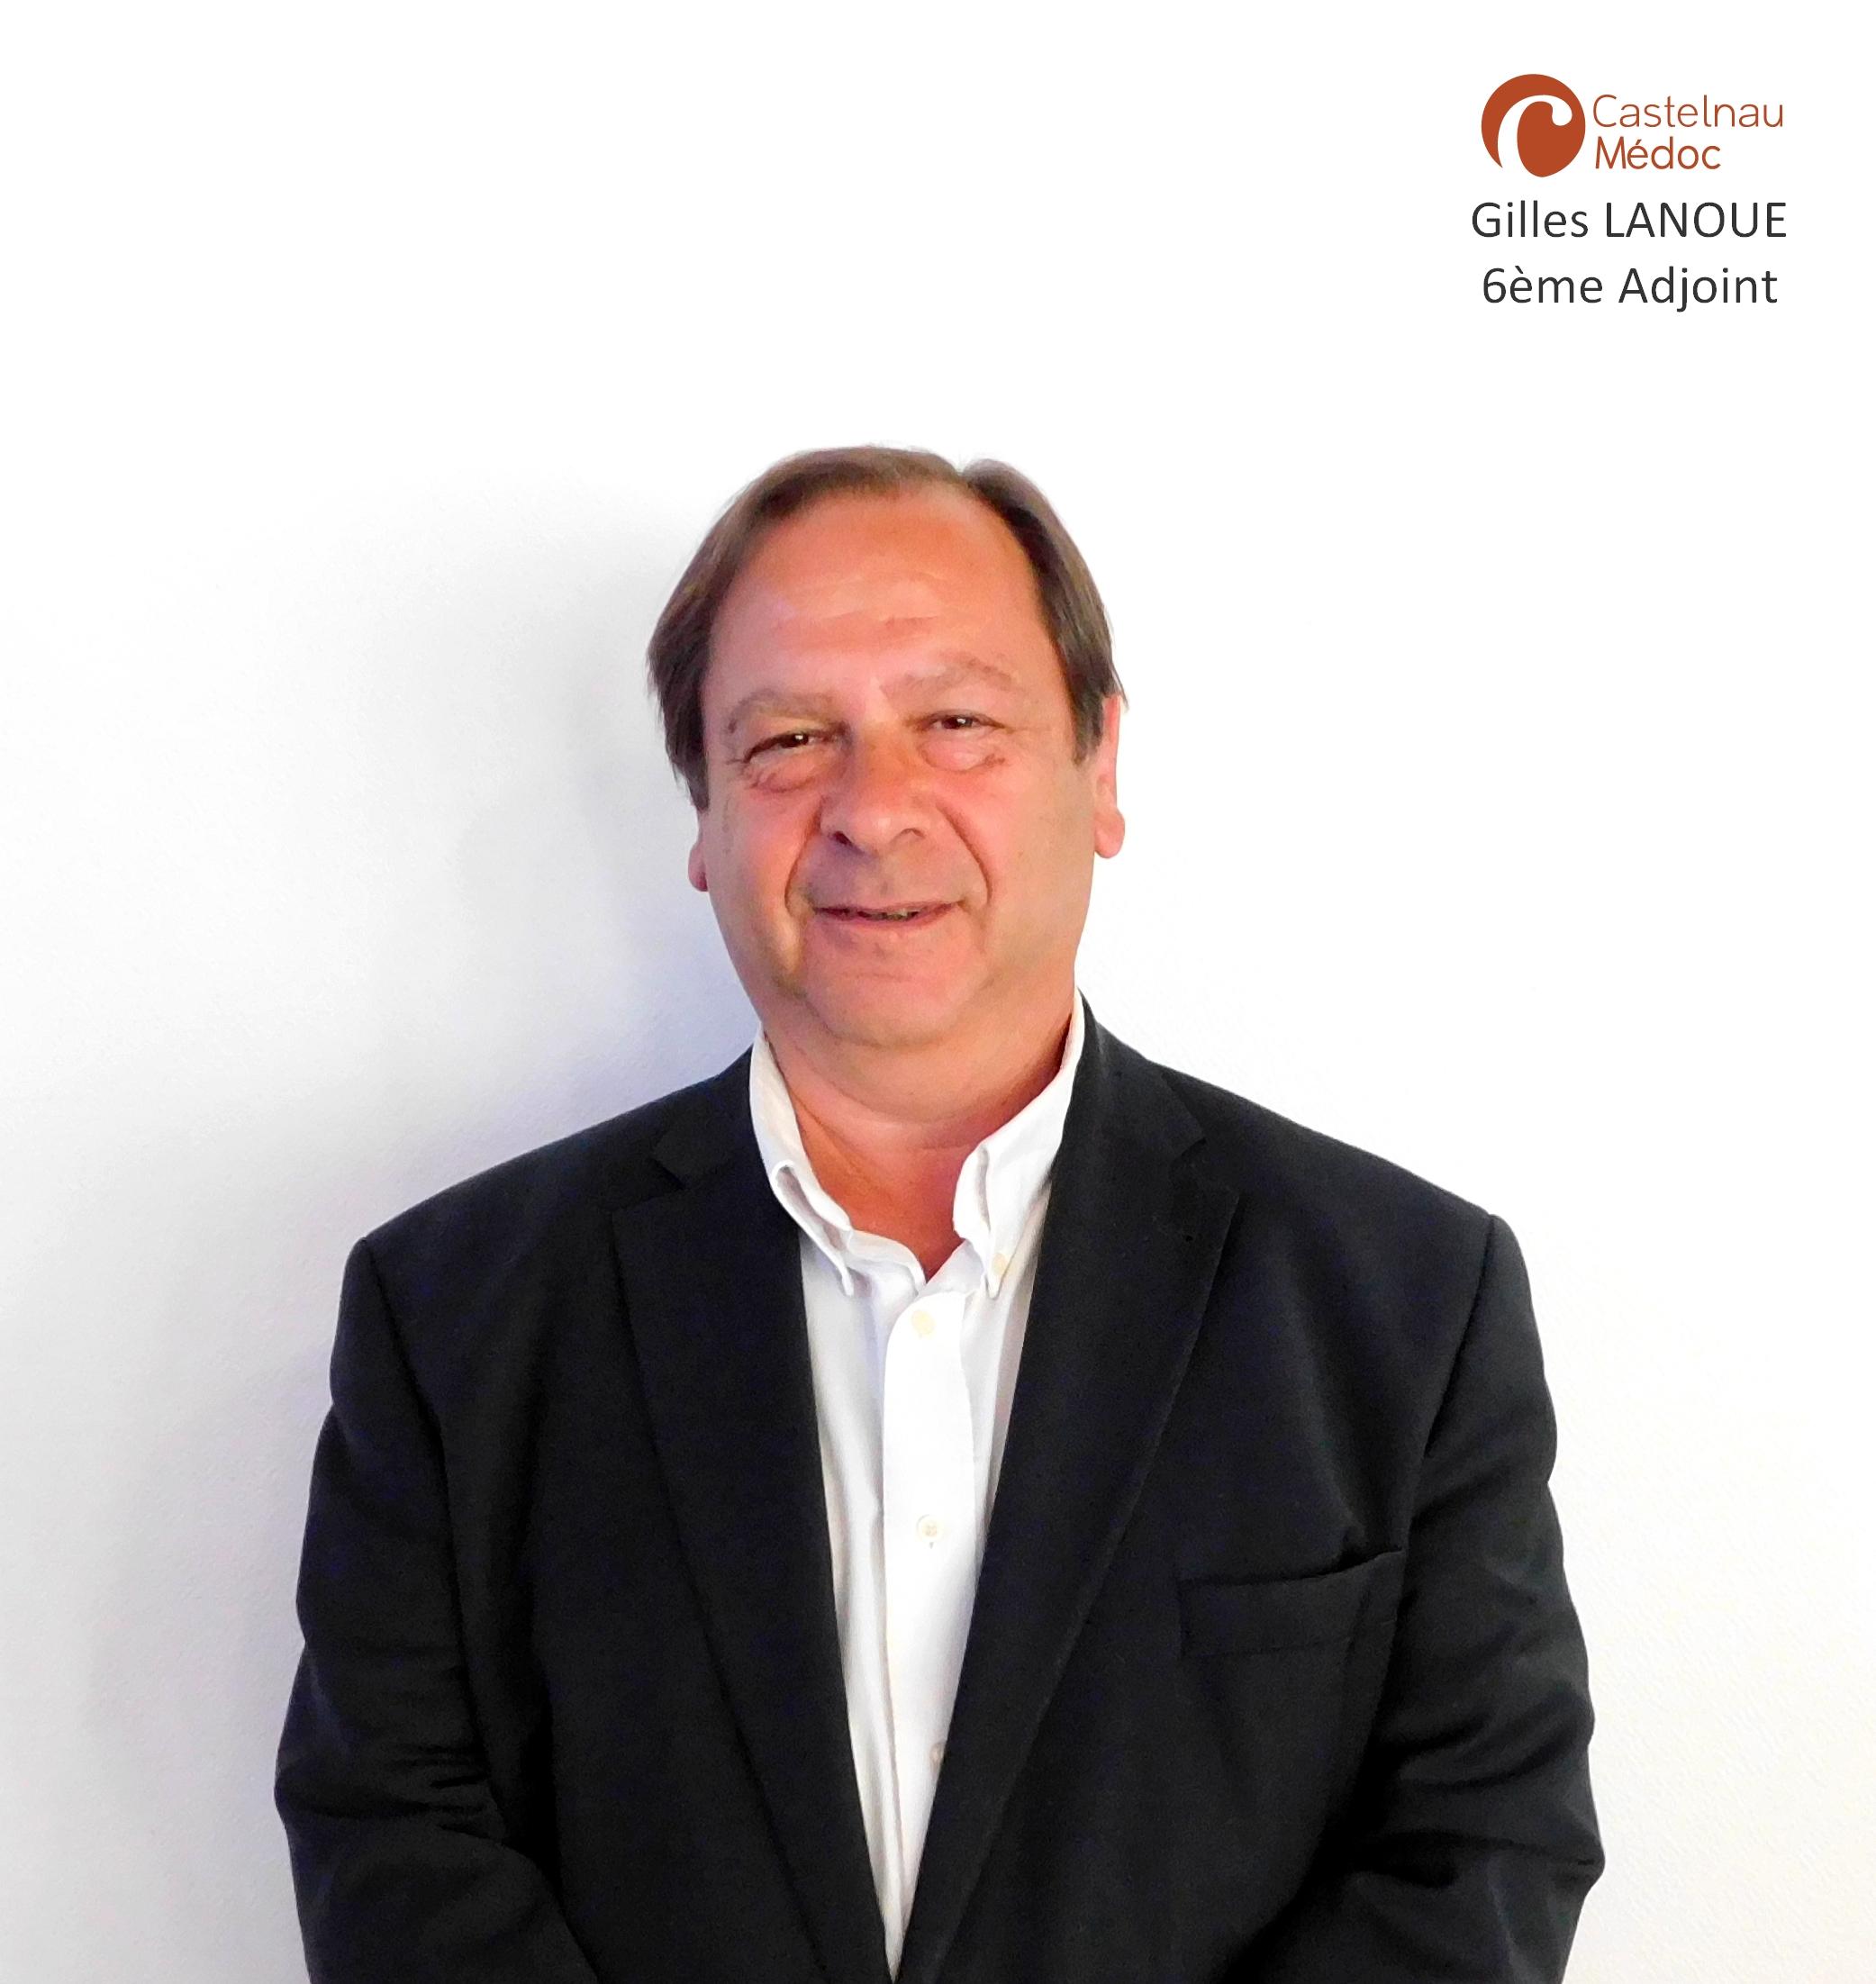 Gilles LANOUE